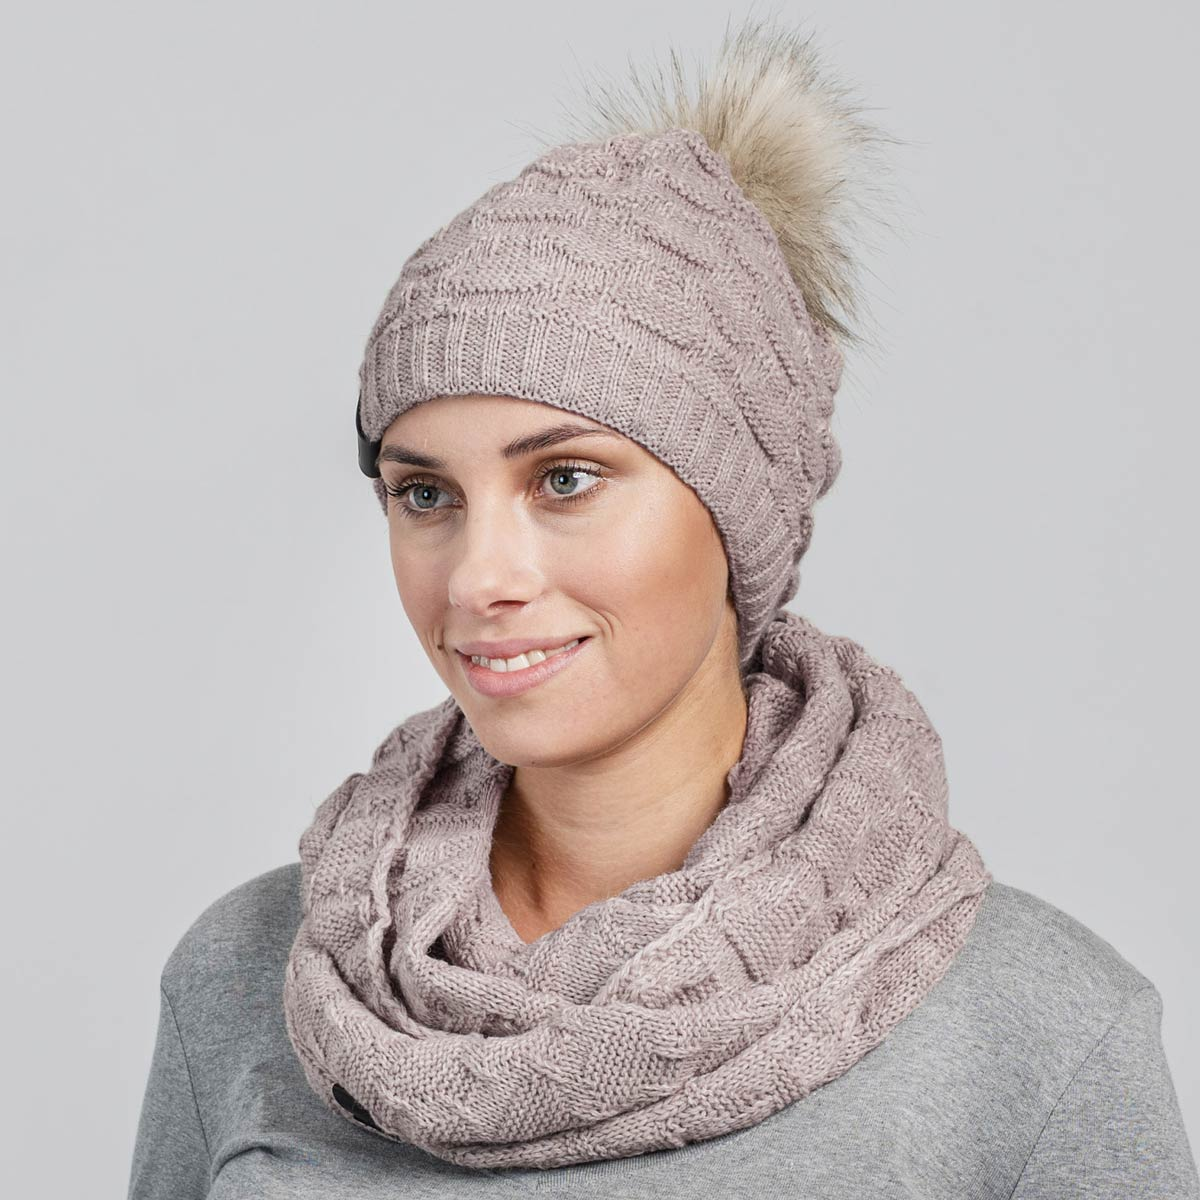 PK-00115_W12-1--_Ensemble-femme-snood-bonnet-beige